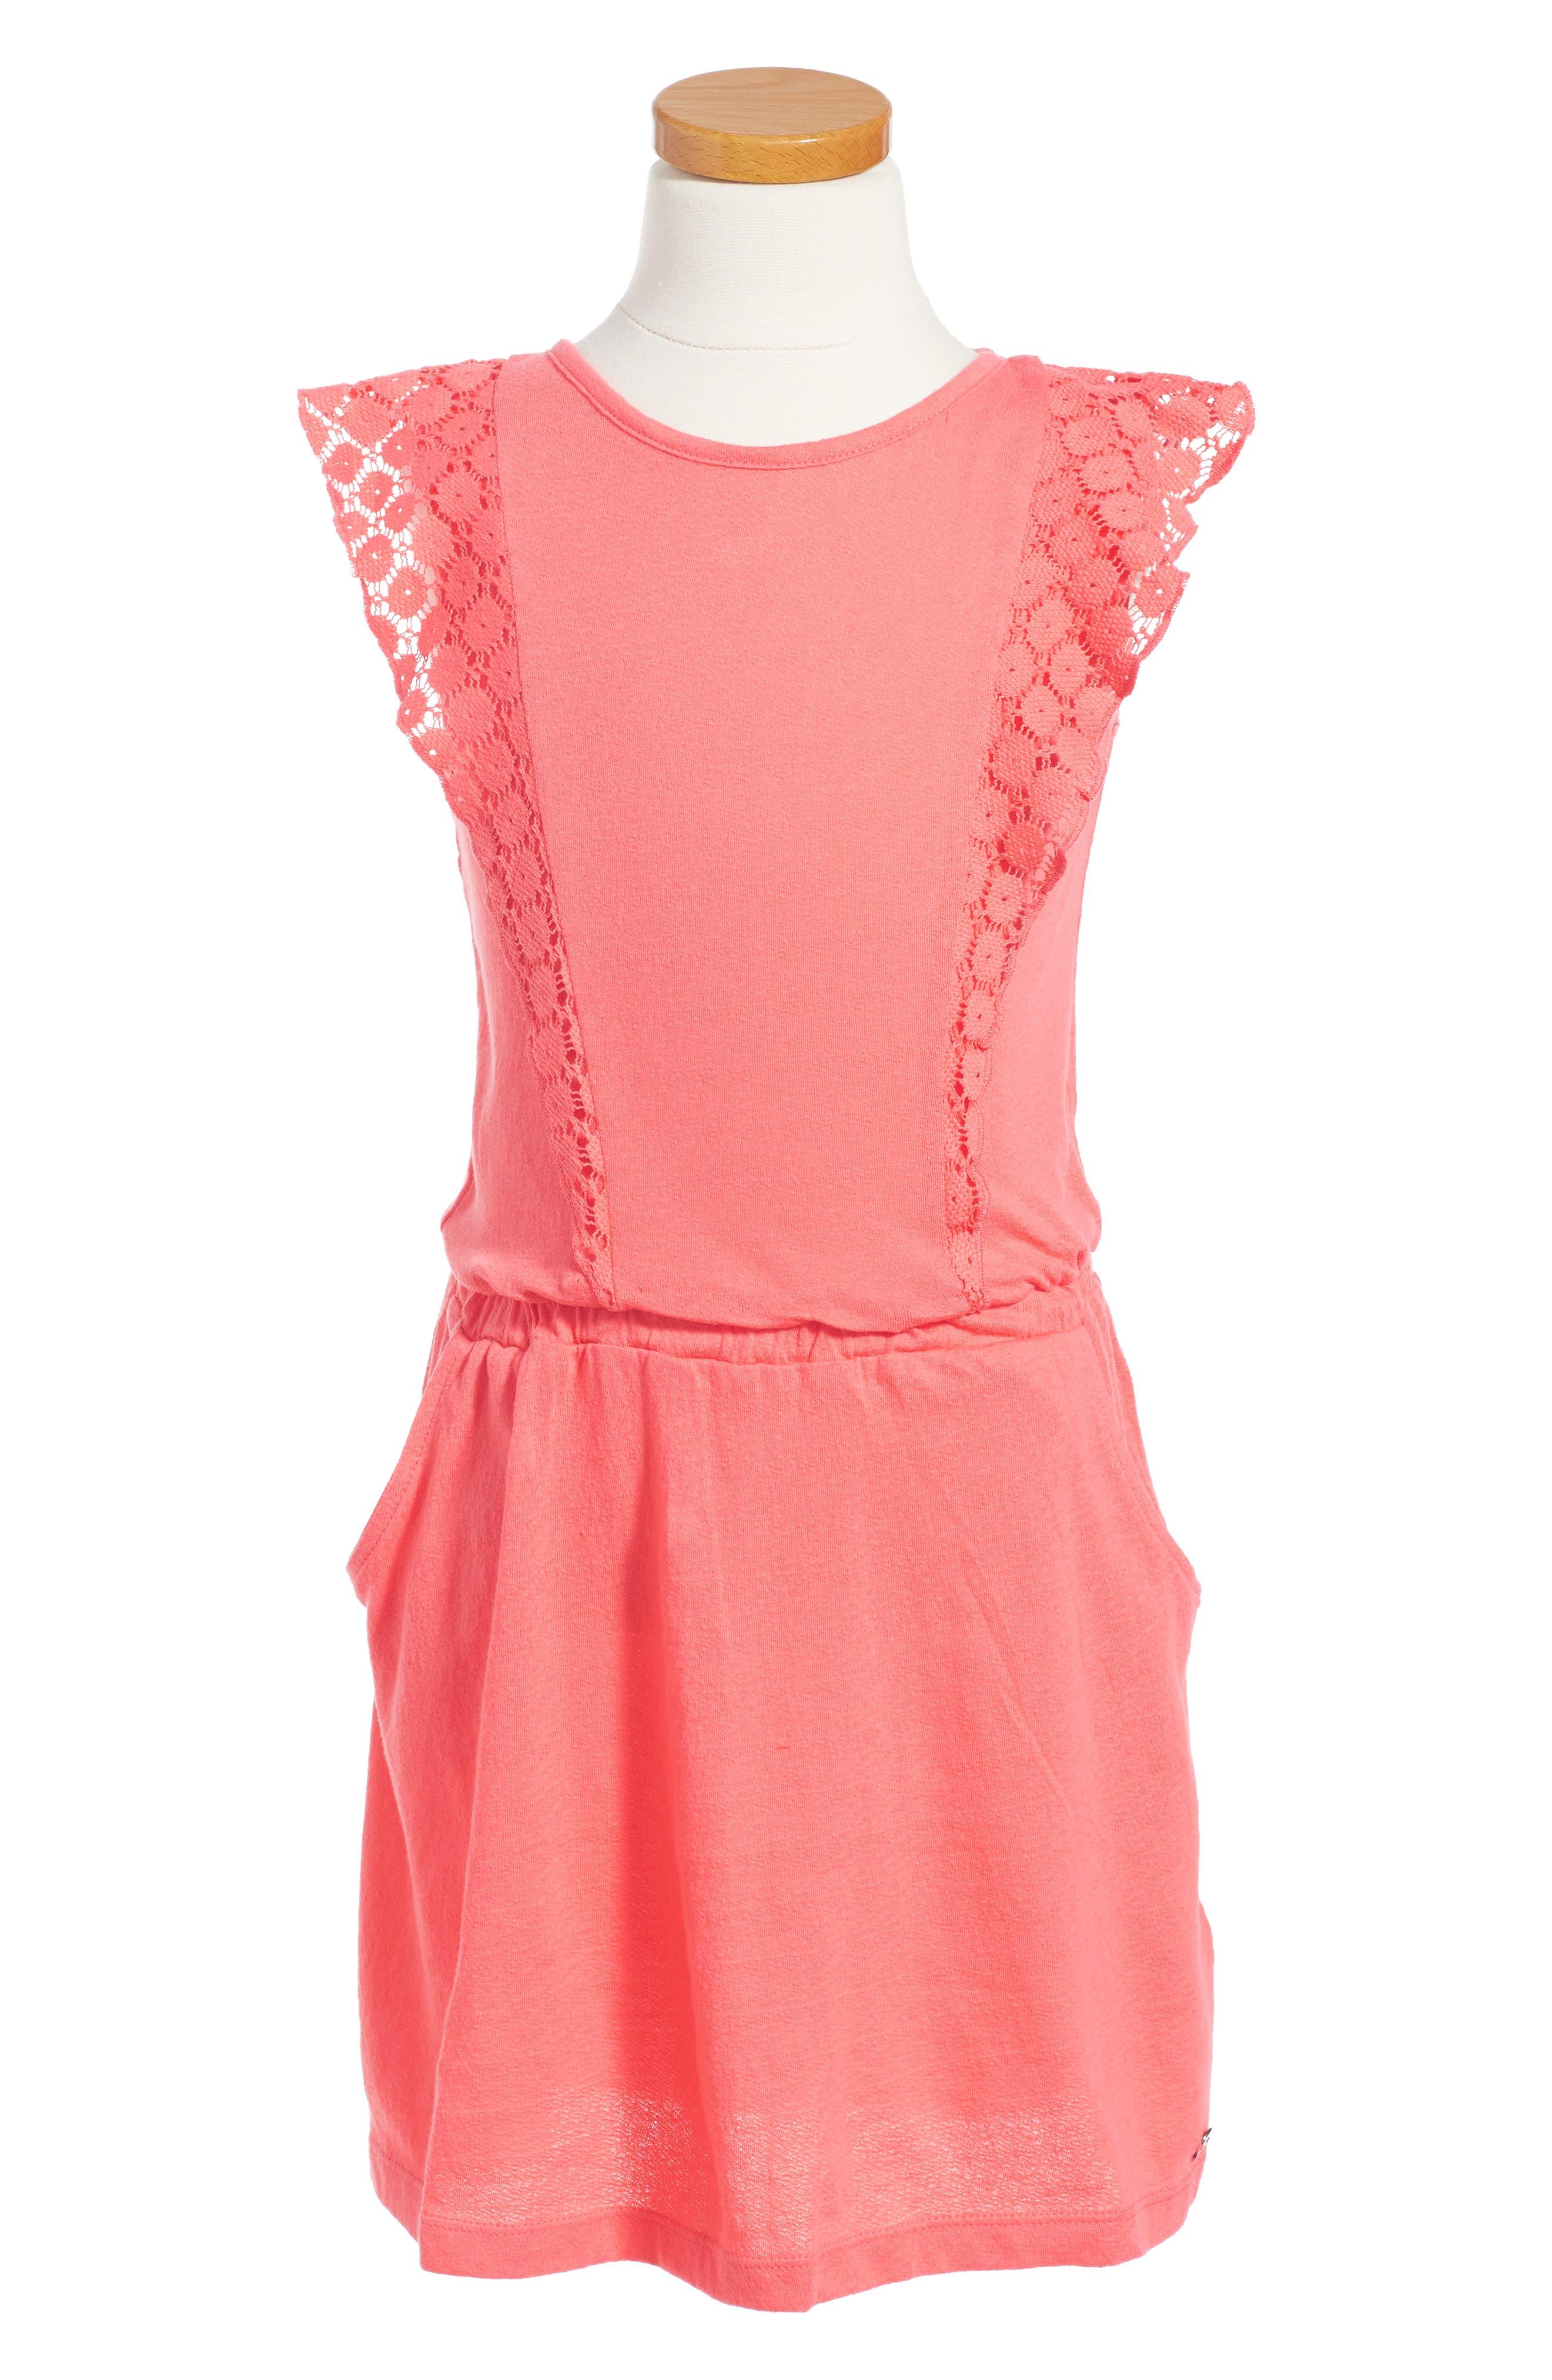 Ur Love Don't Mind Dress,                         Main,                         color, 959